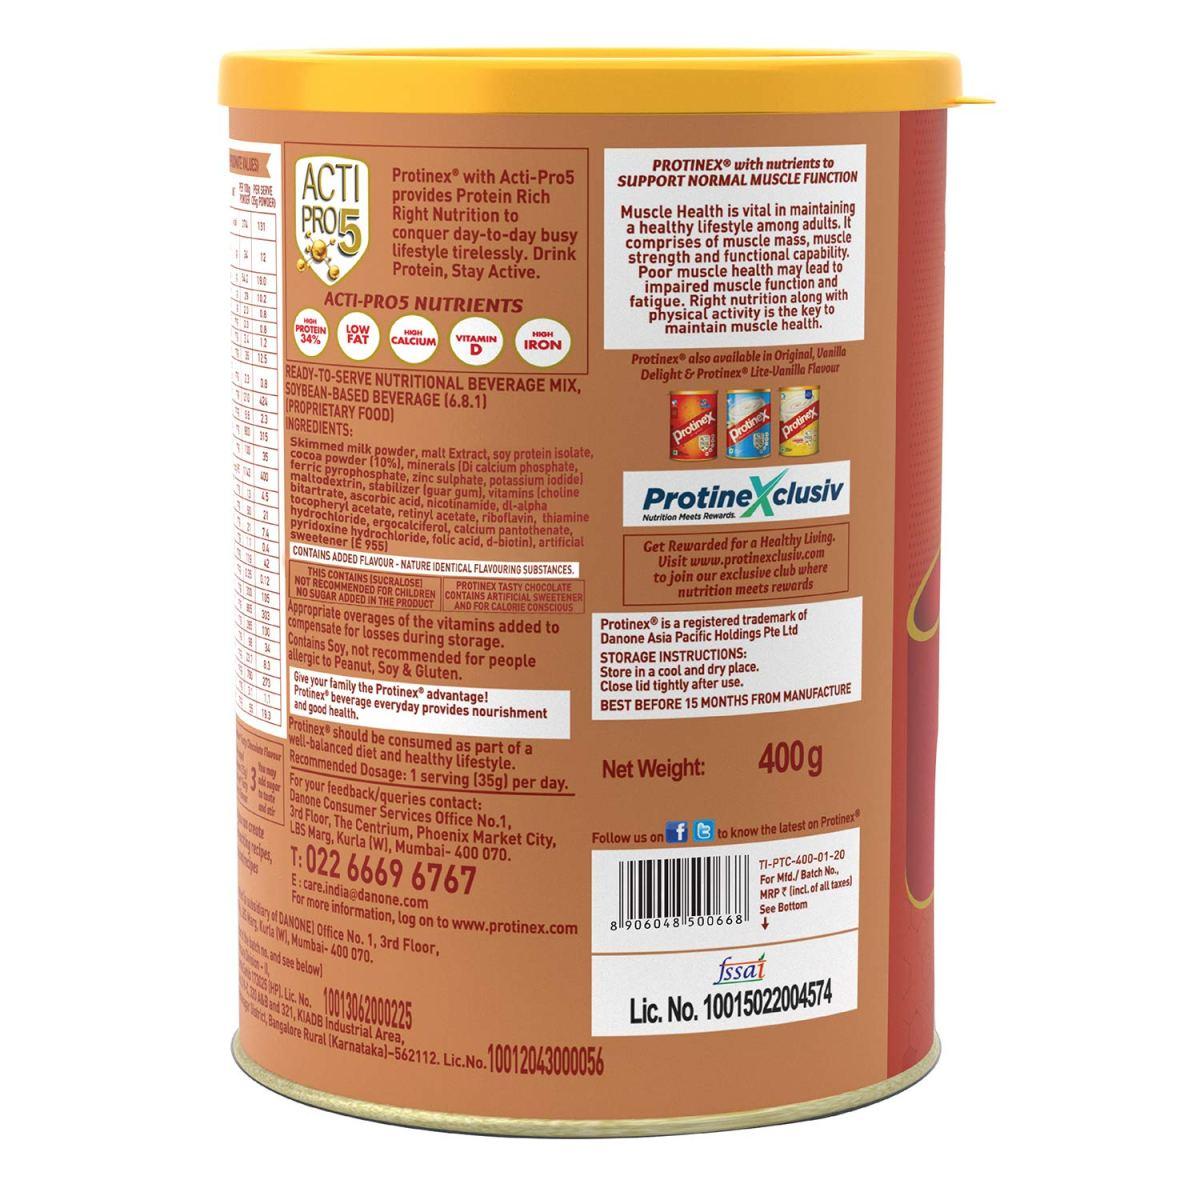 Protinex ingredients